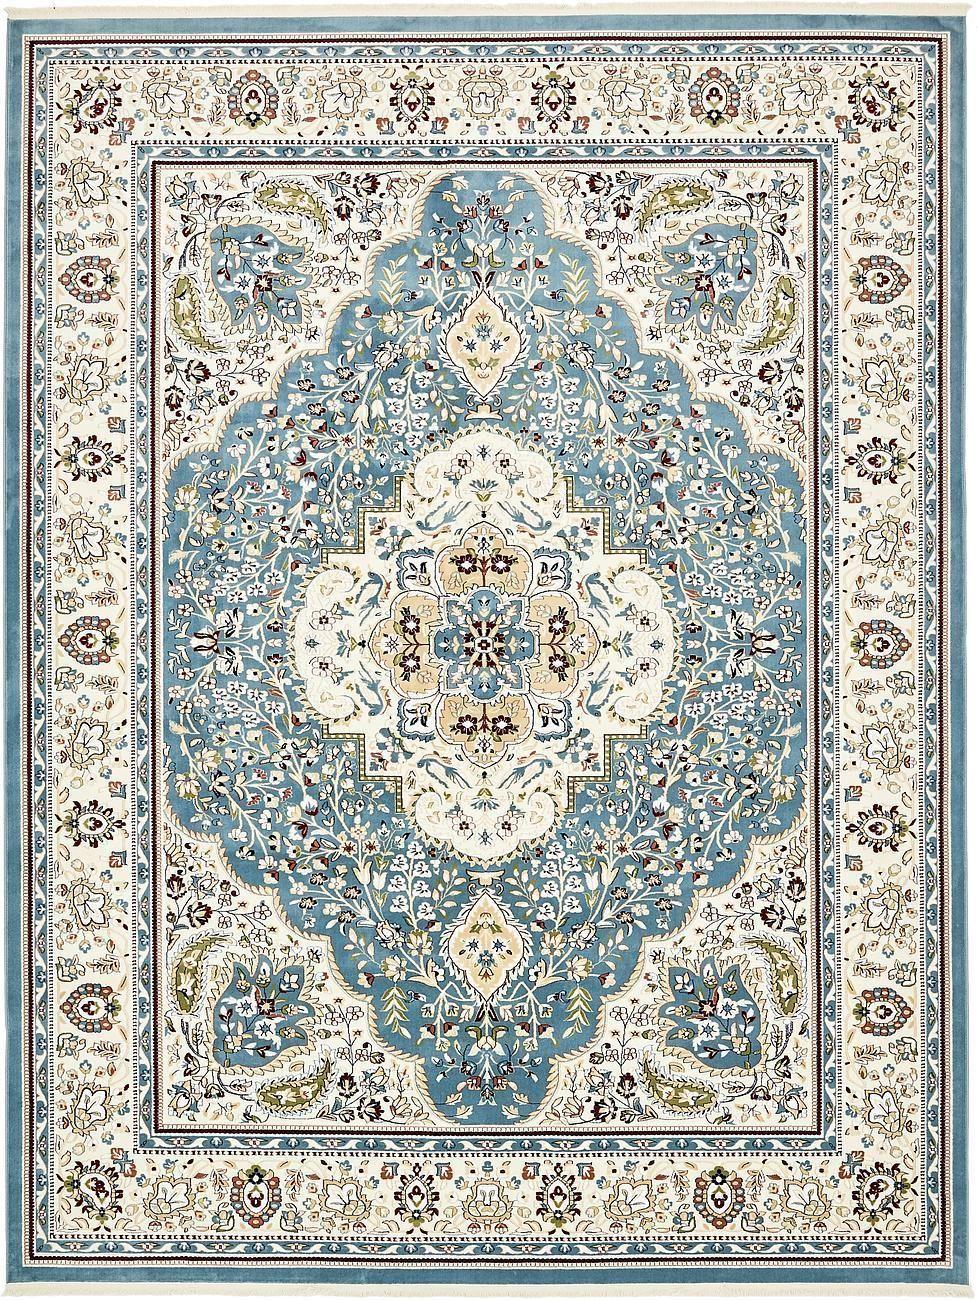 Blue 13 X 19 8 Tabriz Design Rug Area Rugs Esalerugs